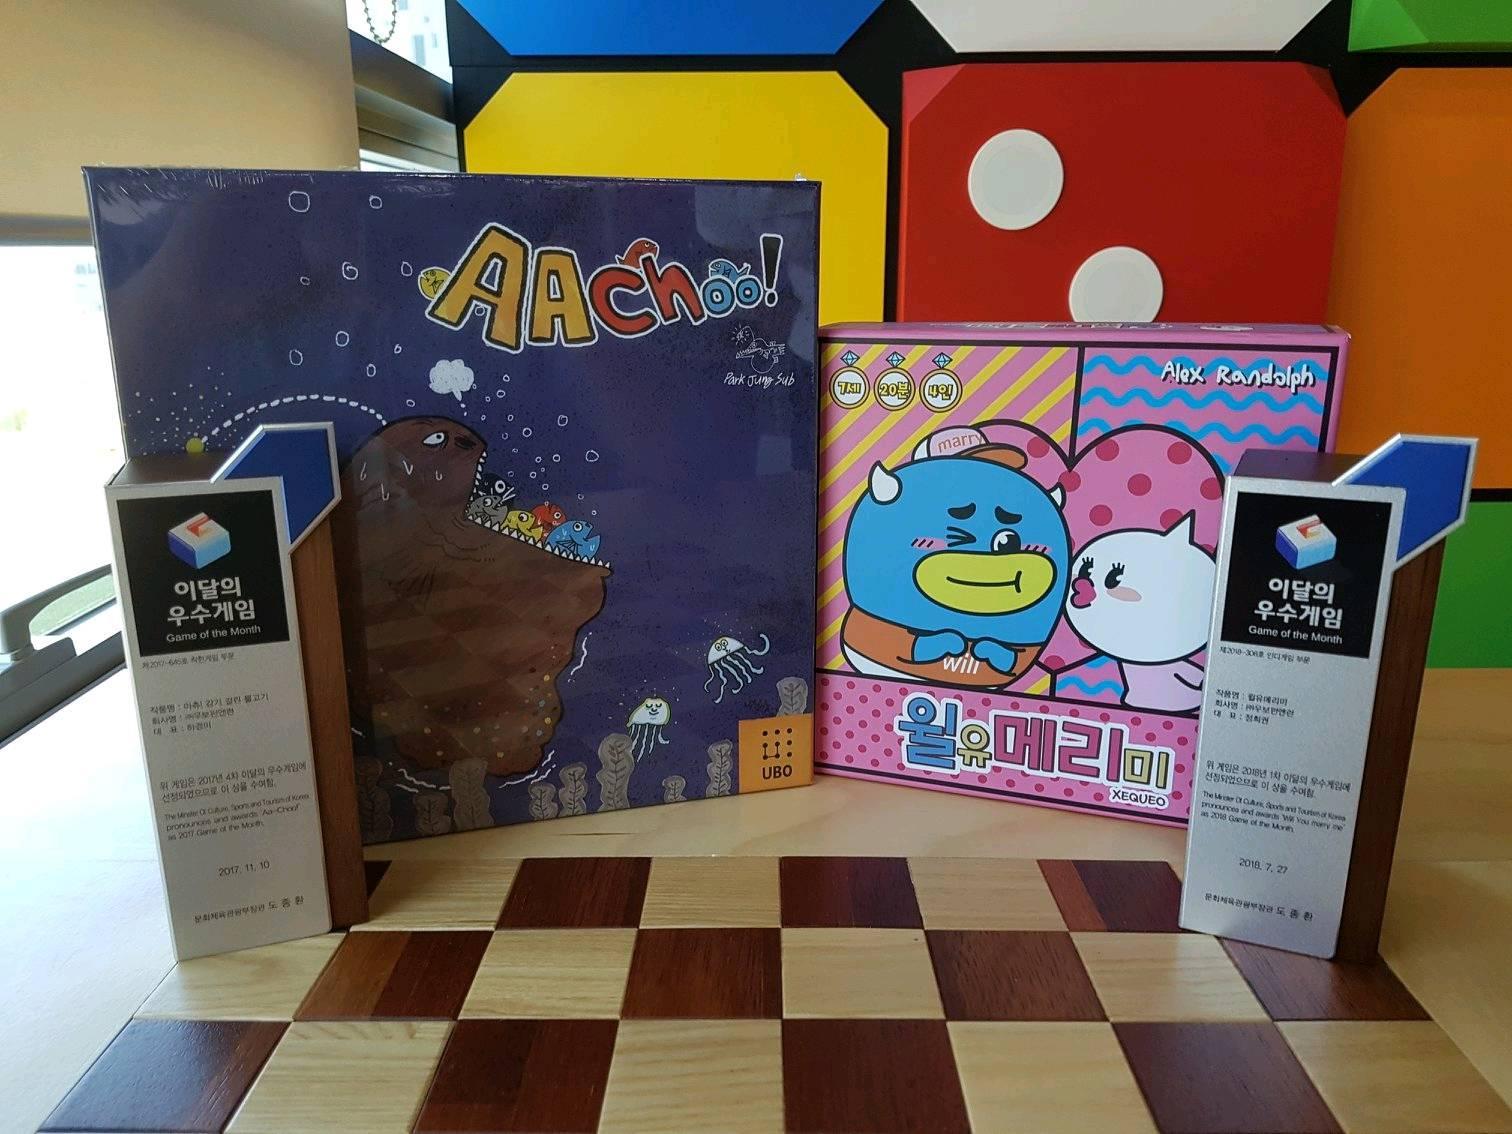 Spiel des Monats Juli in Korea: Will you merry me